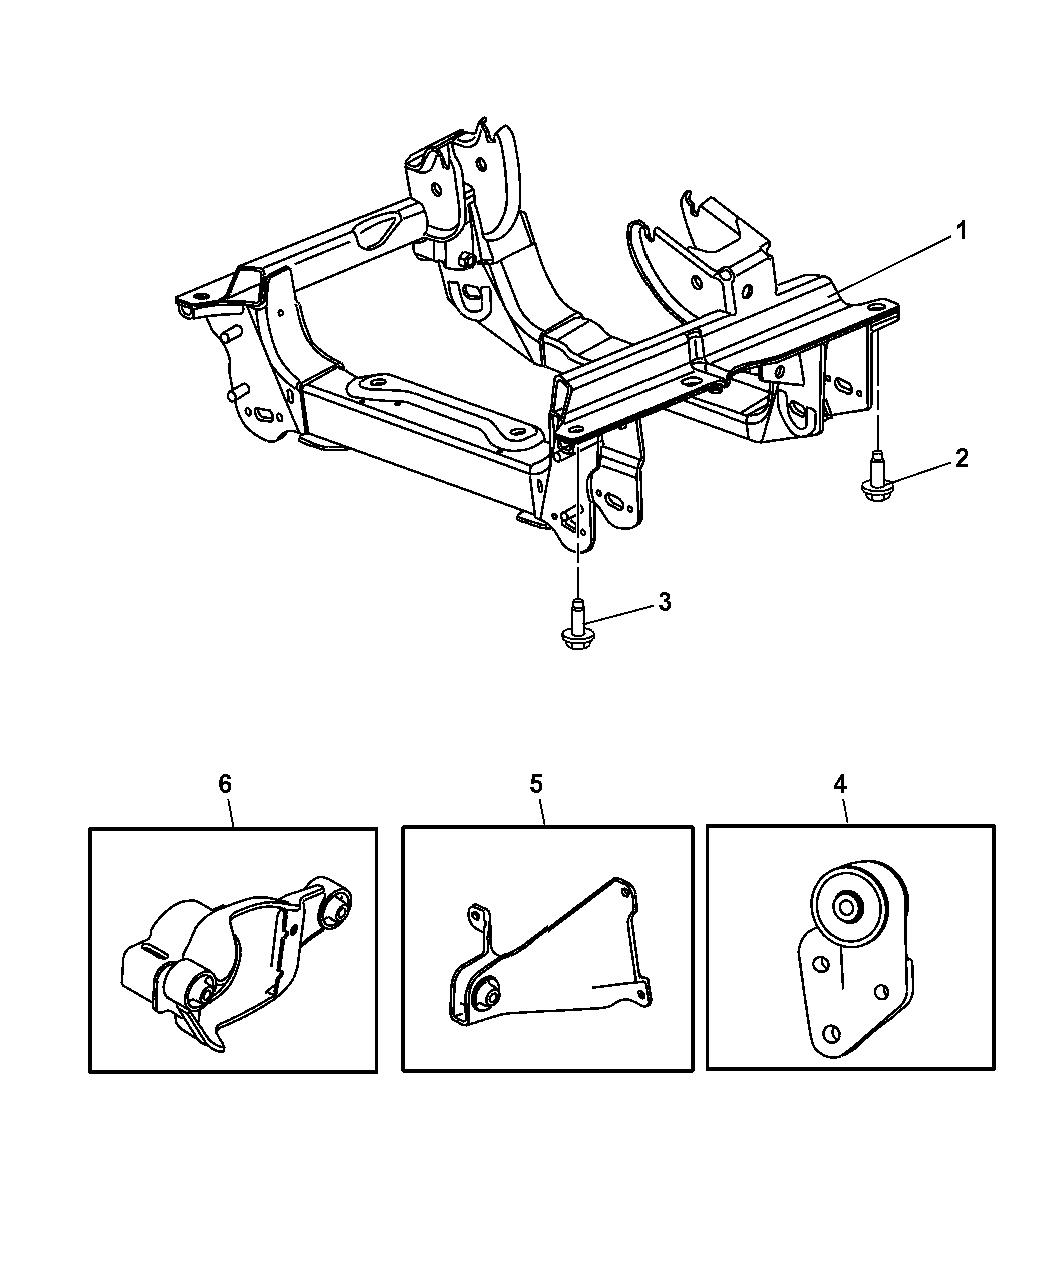 2006 Jeep Liberty Cradle  Front Suspension  U0026 Attaching Parts